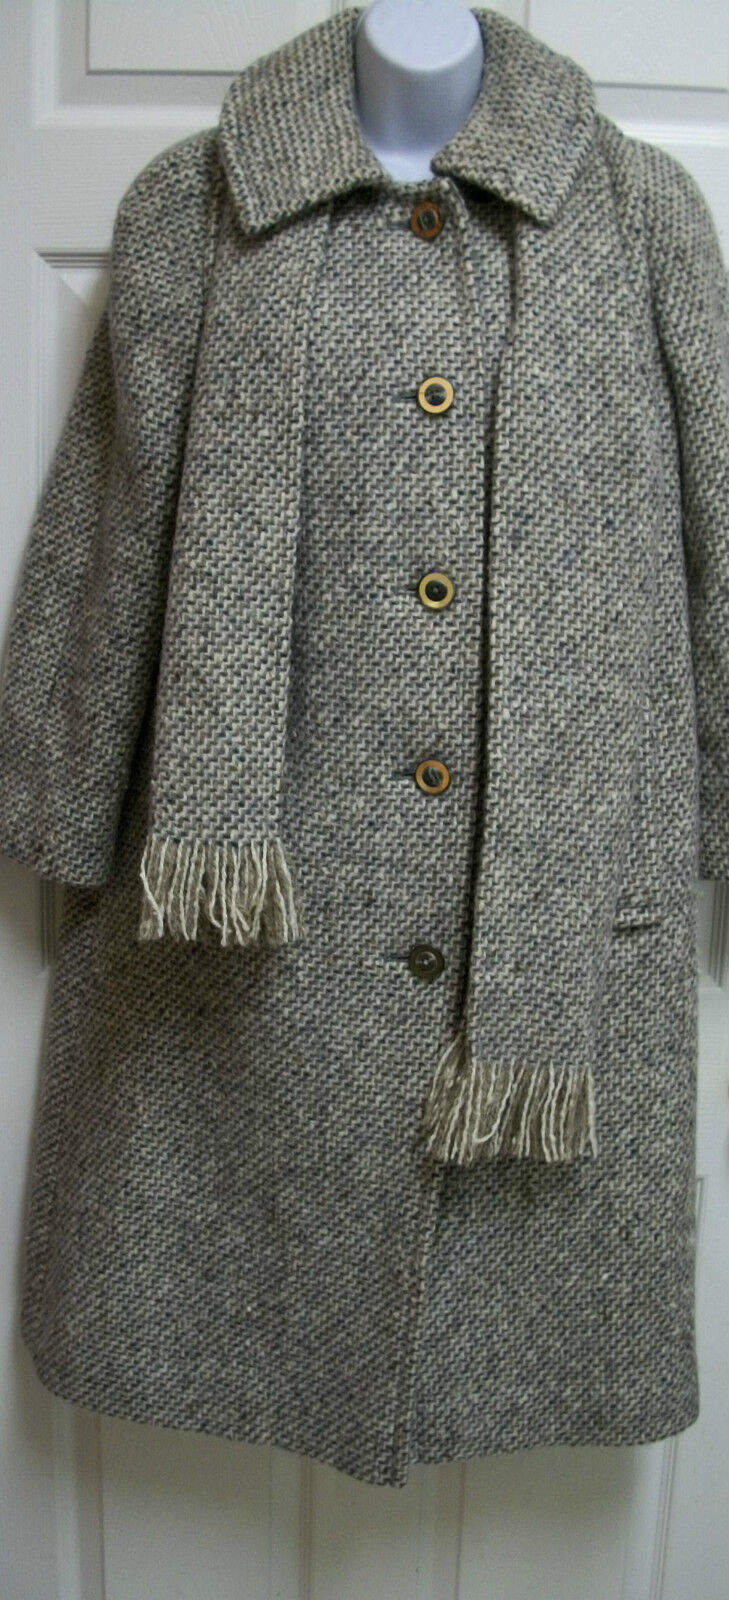 AQUASCUTUM GORGEOUS VINTAGE TWEED WOOL A-LINE DRESS COAT & FRINGED SCARF ENGLAND